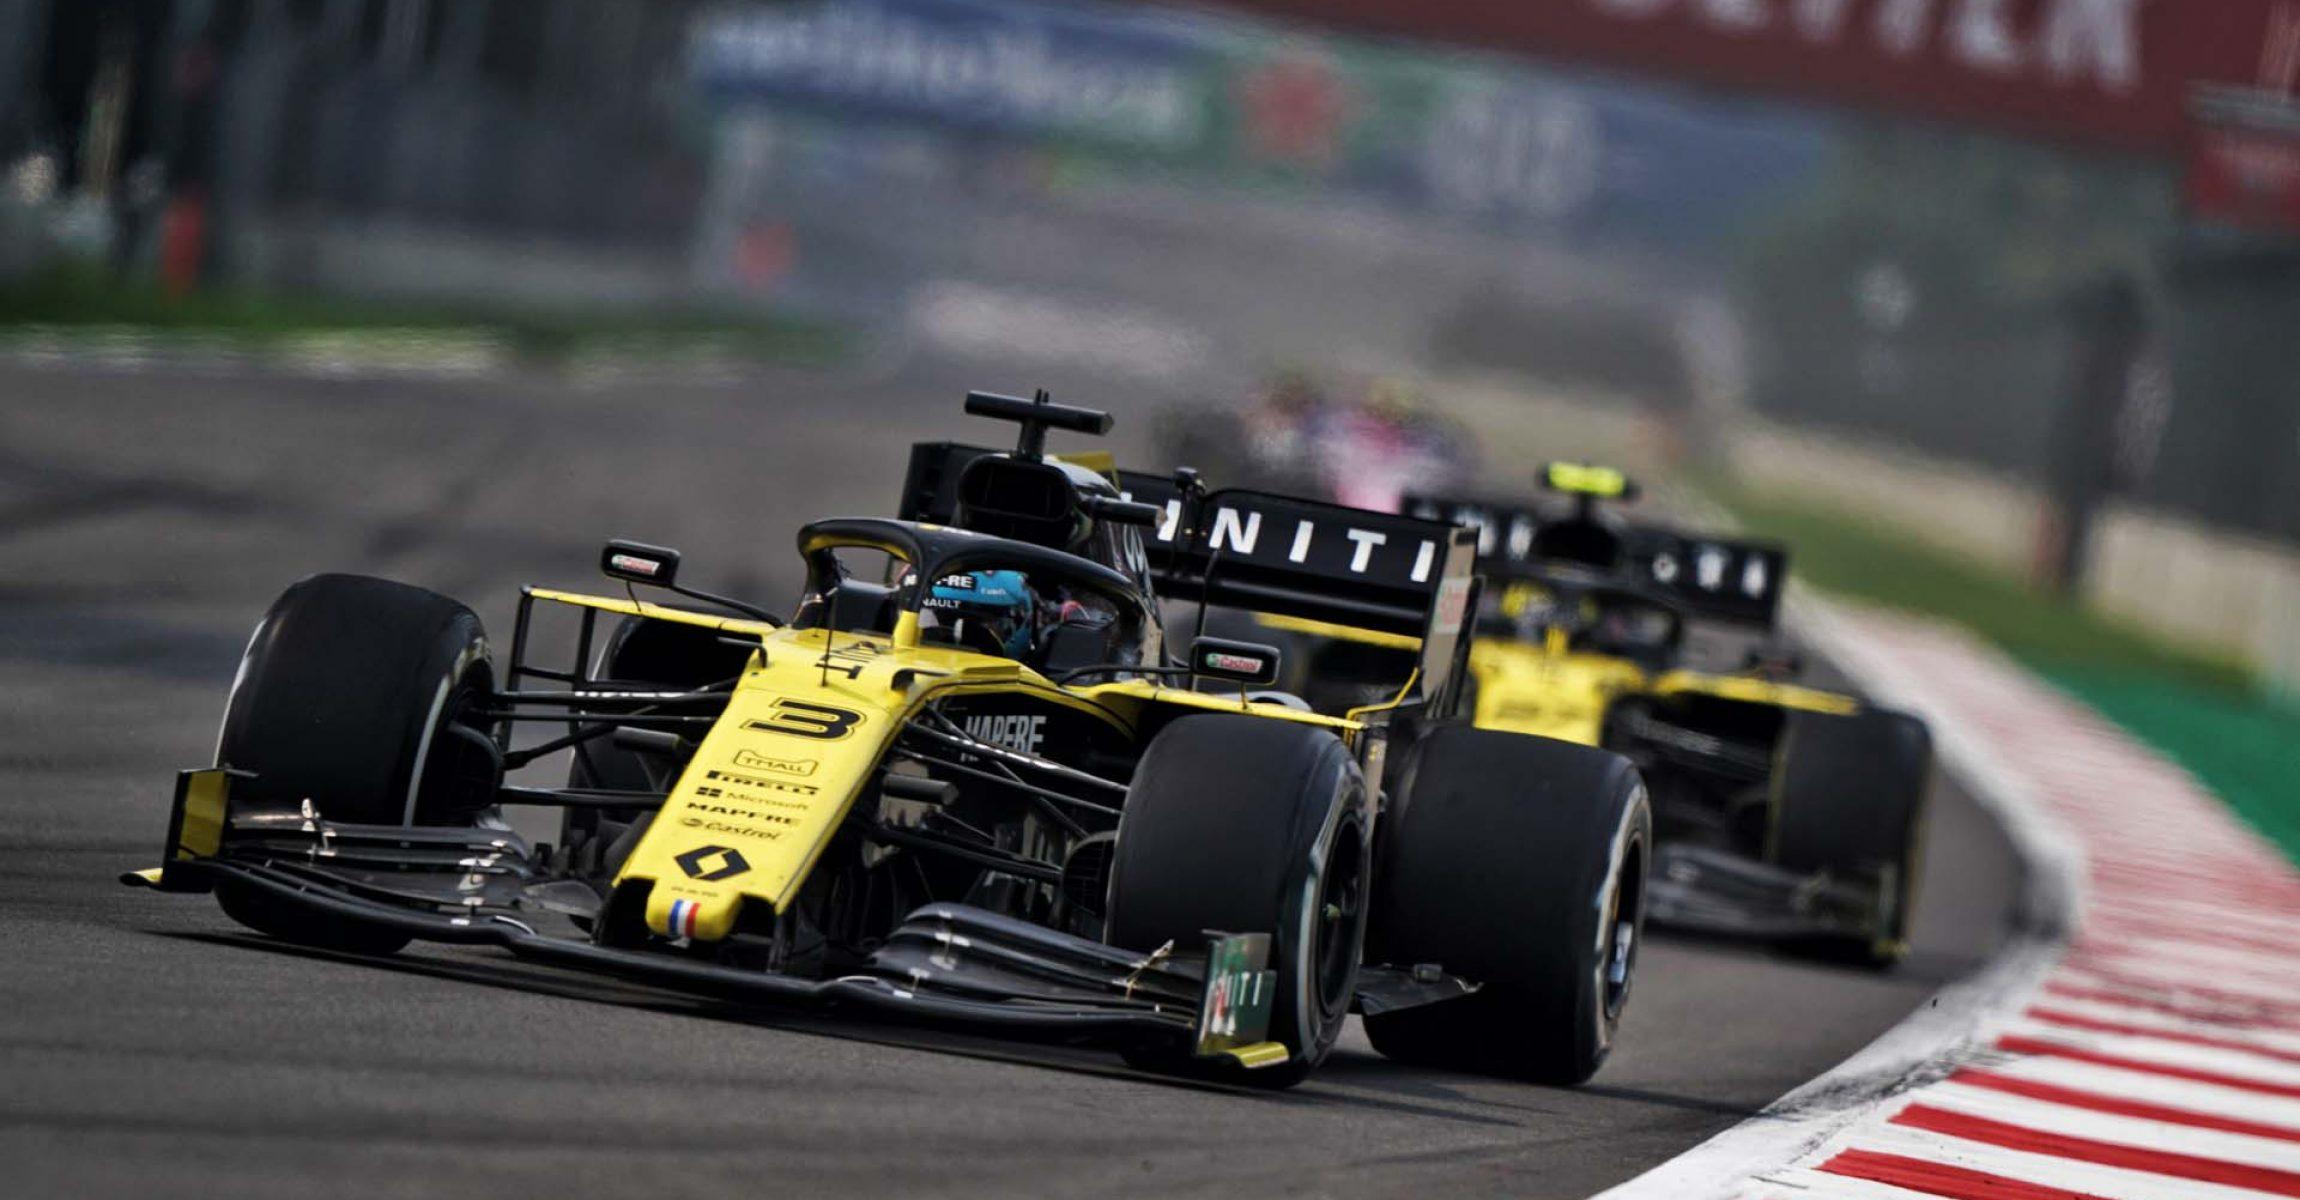 Daniel Ricciardo (AUS) Renault F1 Team RS19.                                Mexican Grand Prix, Sunday 27th October 2019. Mexico City, Mexico.